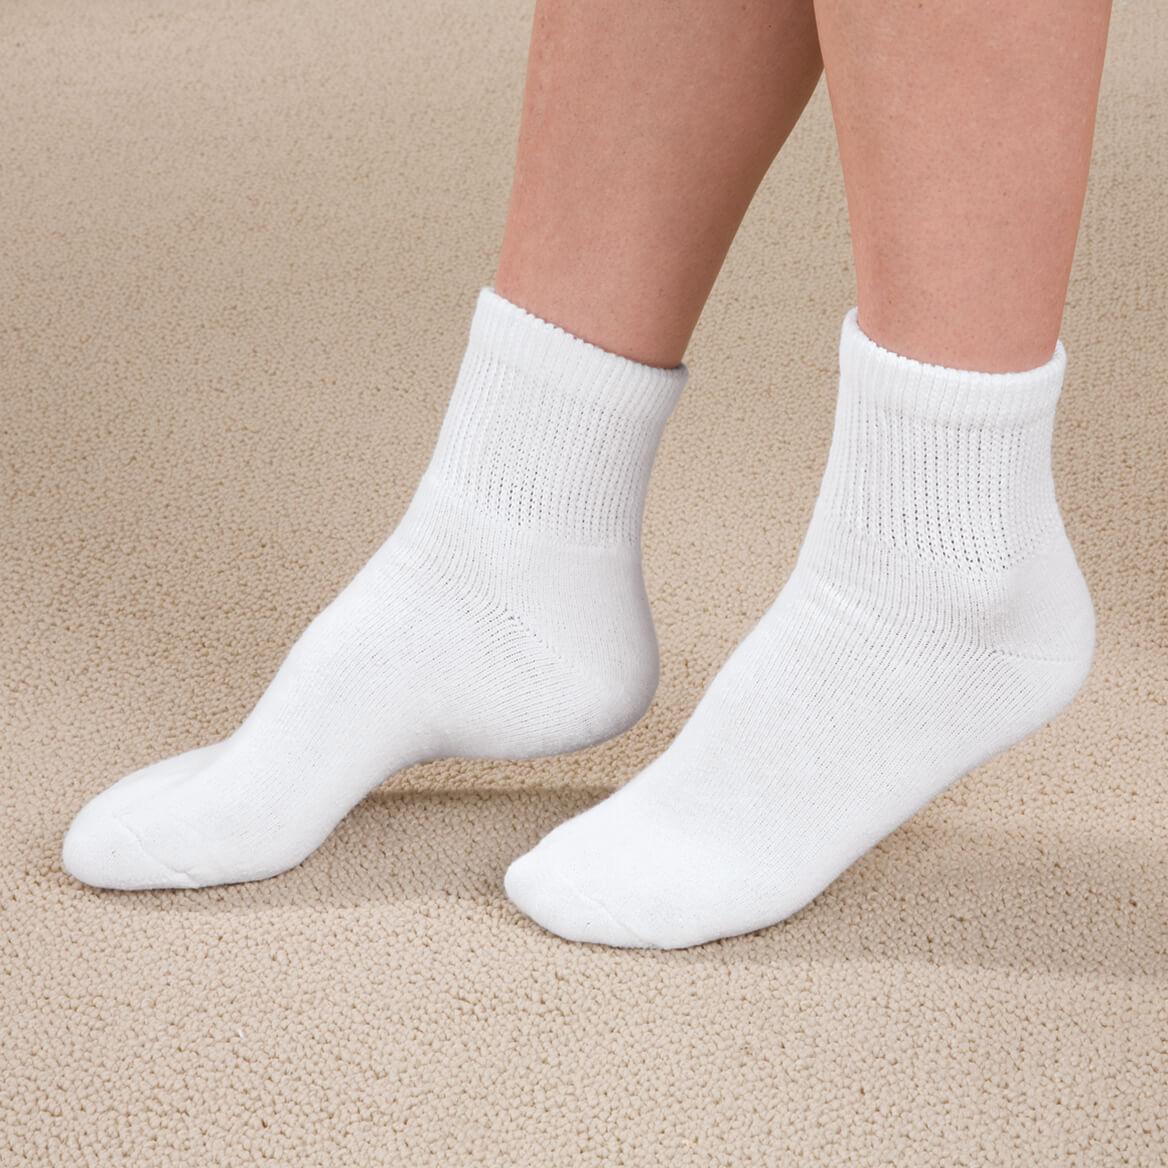 Diabetic Ankle Socks - 3 Pack-339943